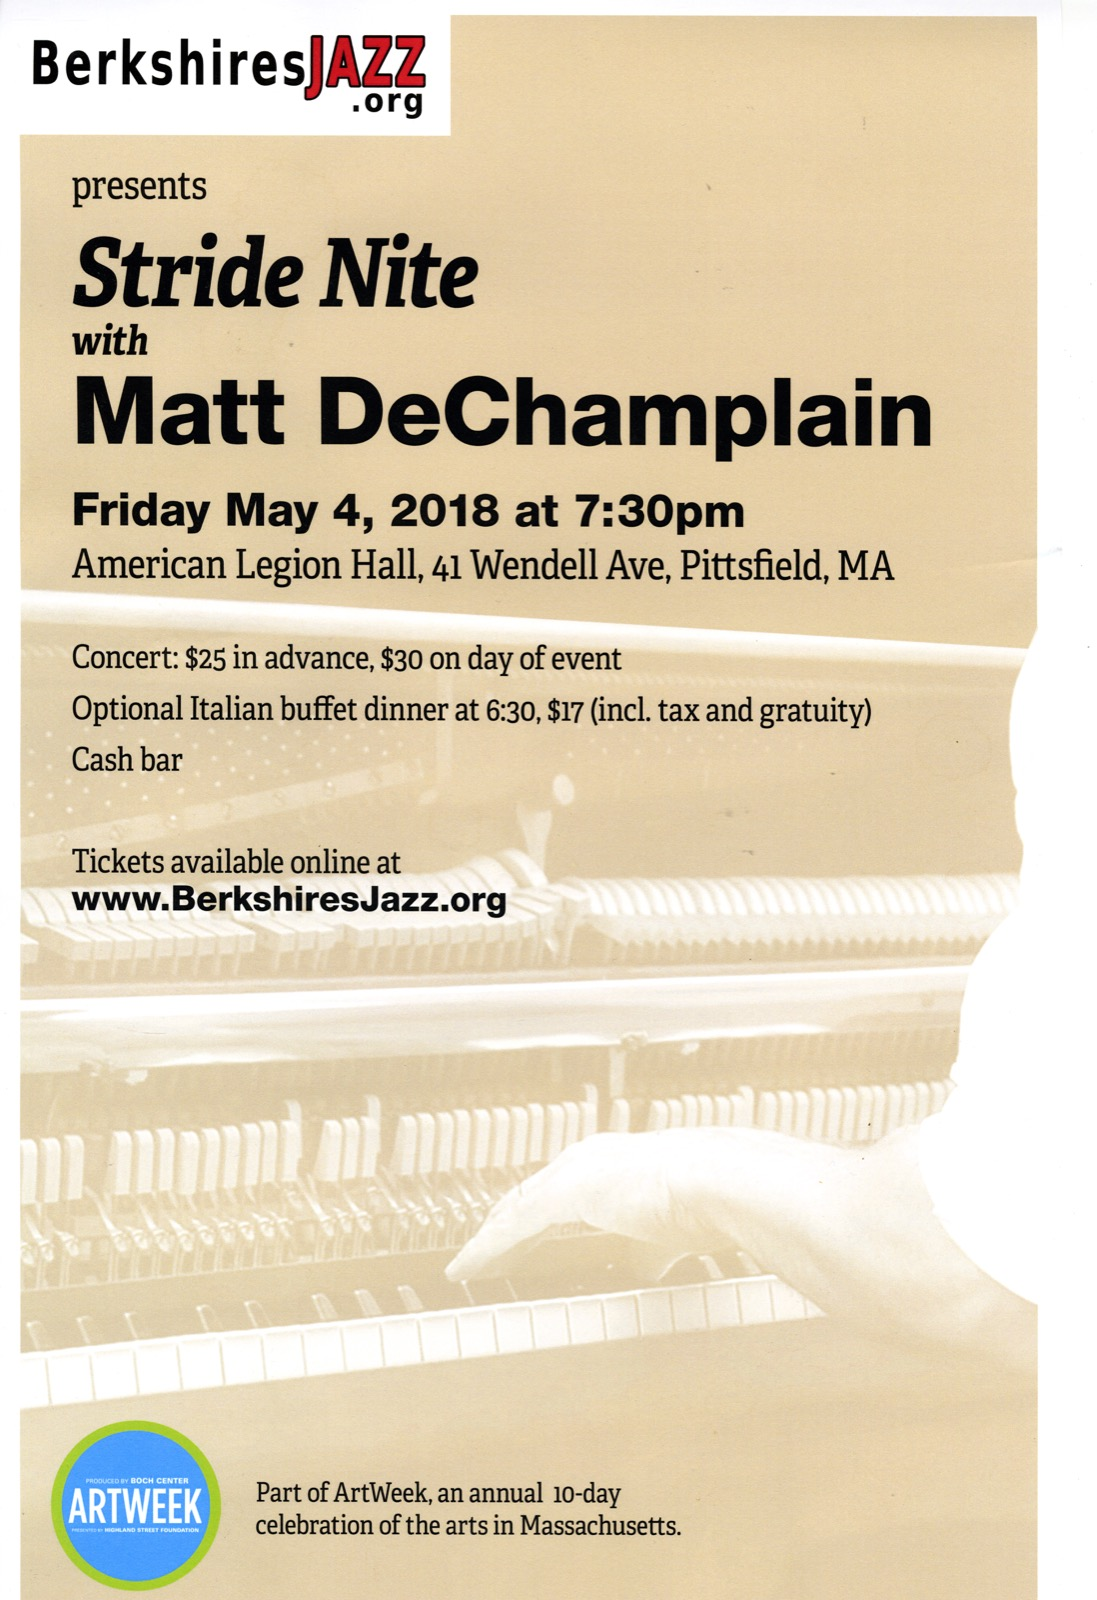 Berkshire_Jazz_Presents_Stride_Nite001.jpg